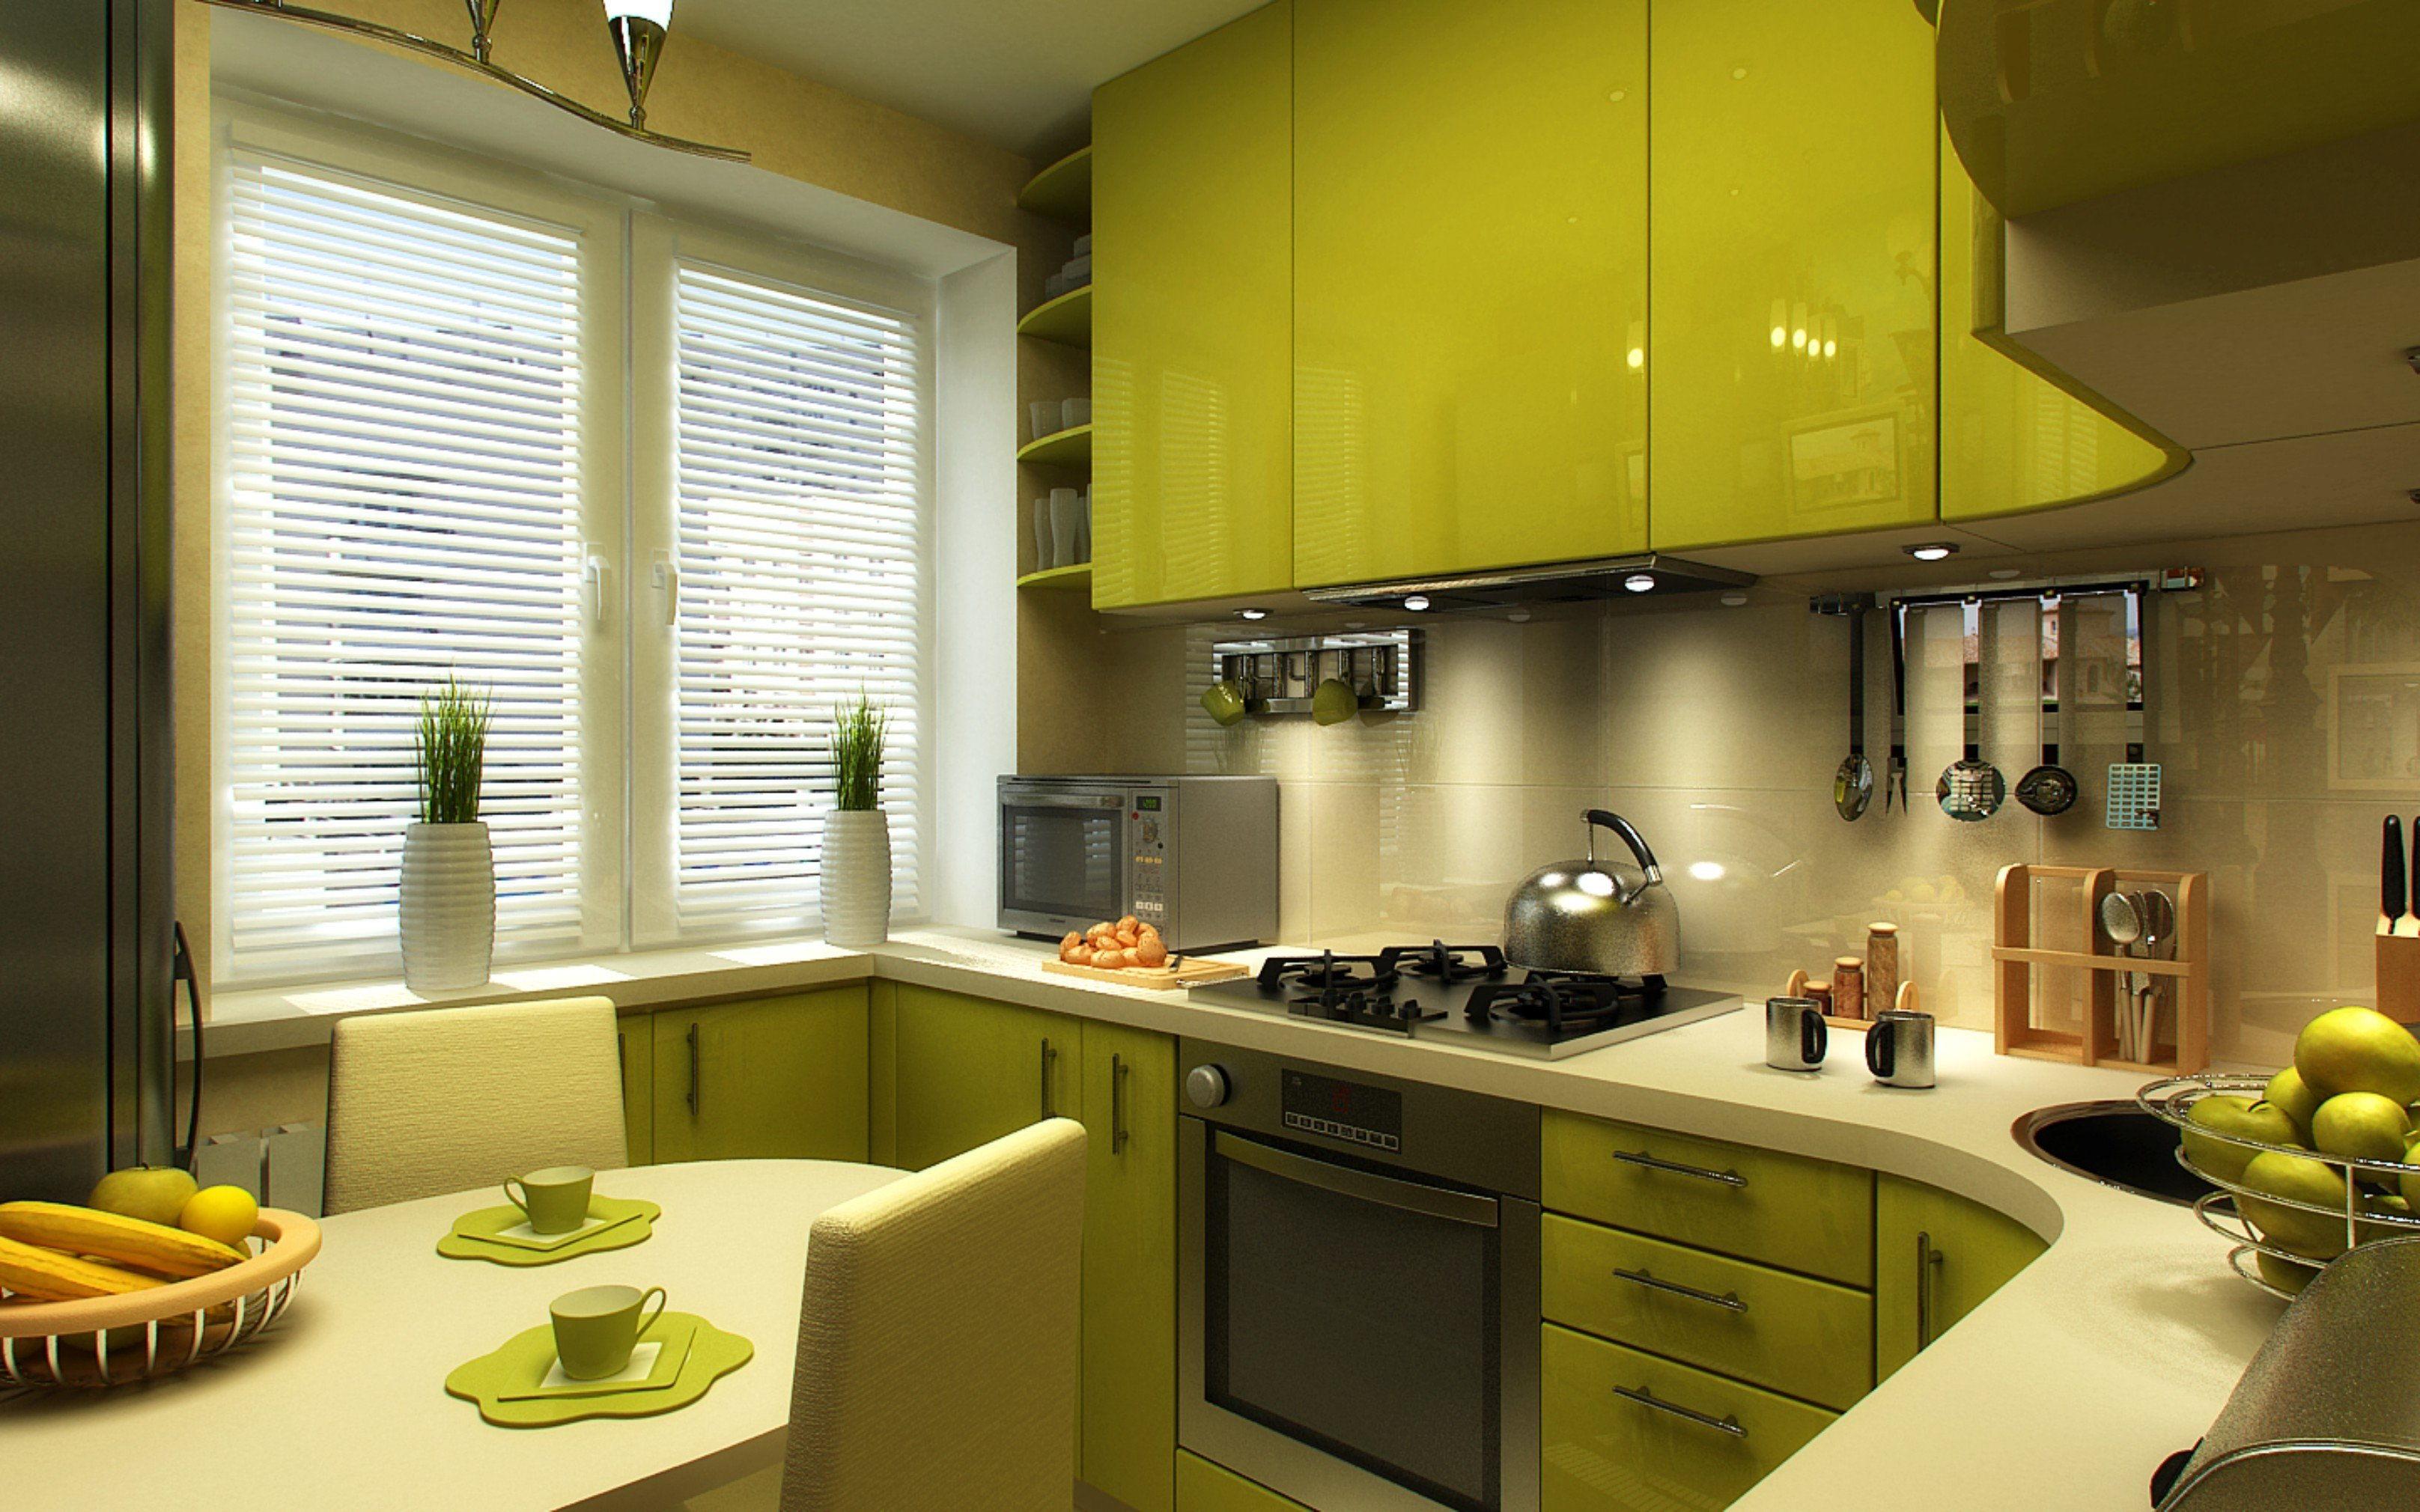 Кухня 6 кв м зеленая